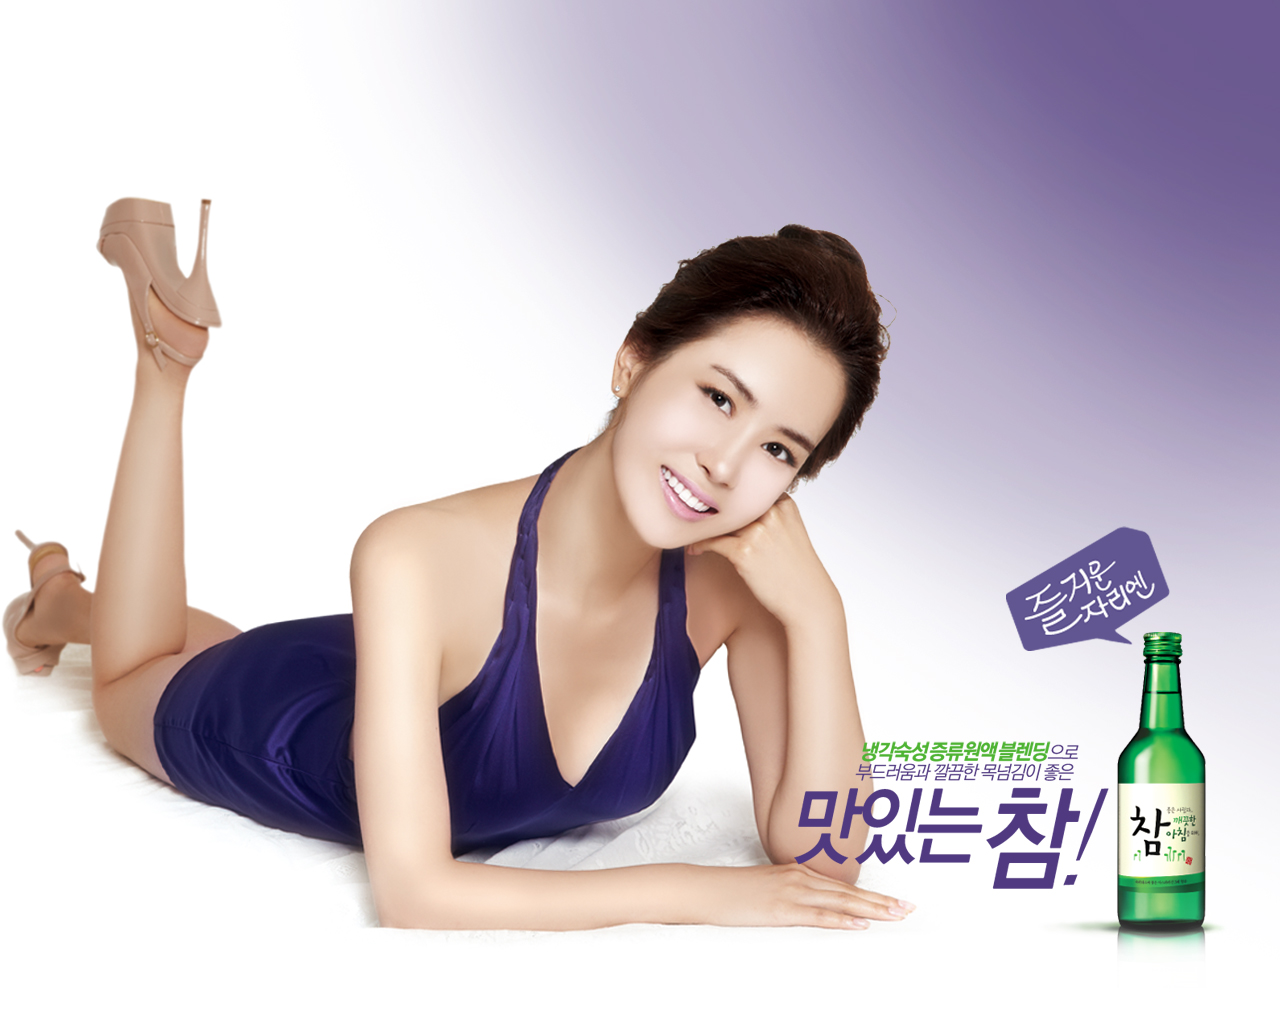 Korean Photoshop Disaster #9: Soju - The Grand Narrative